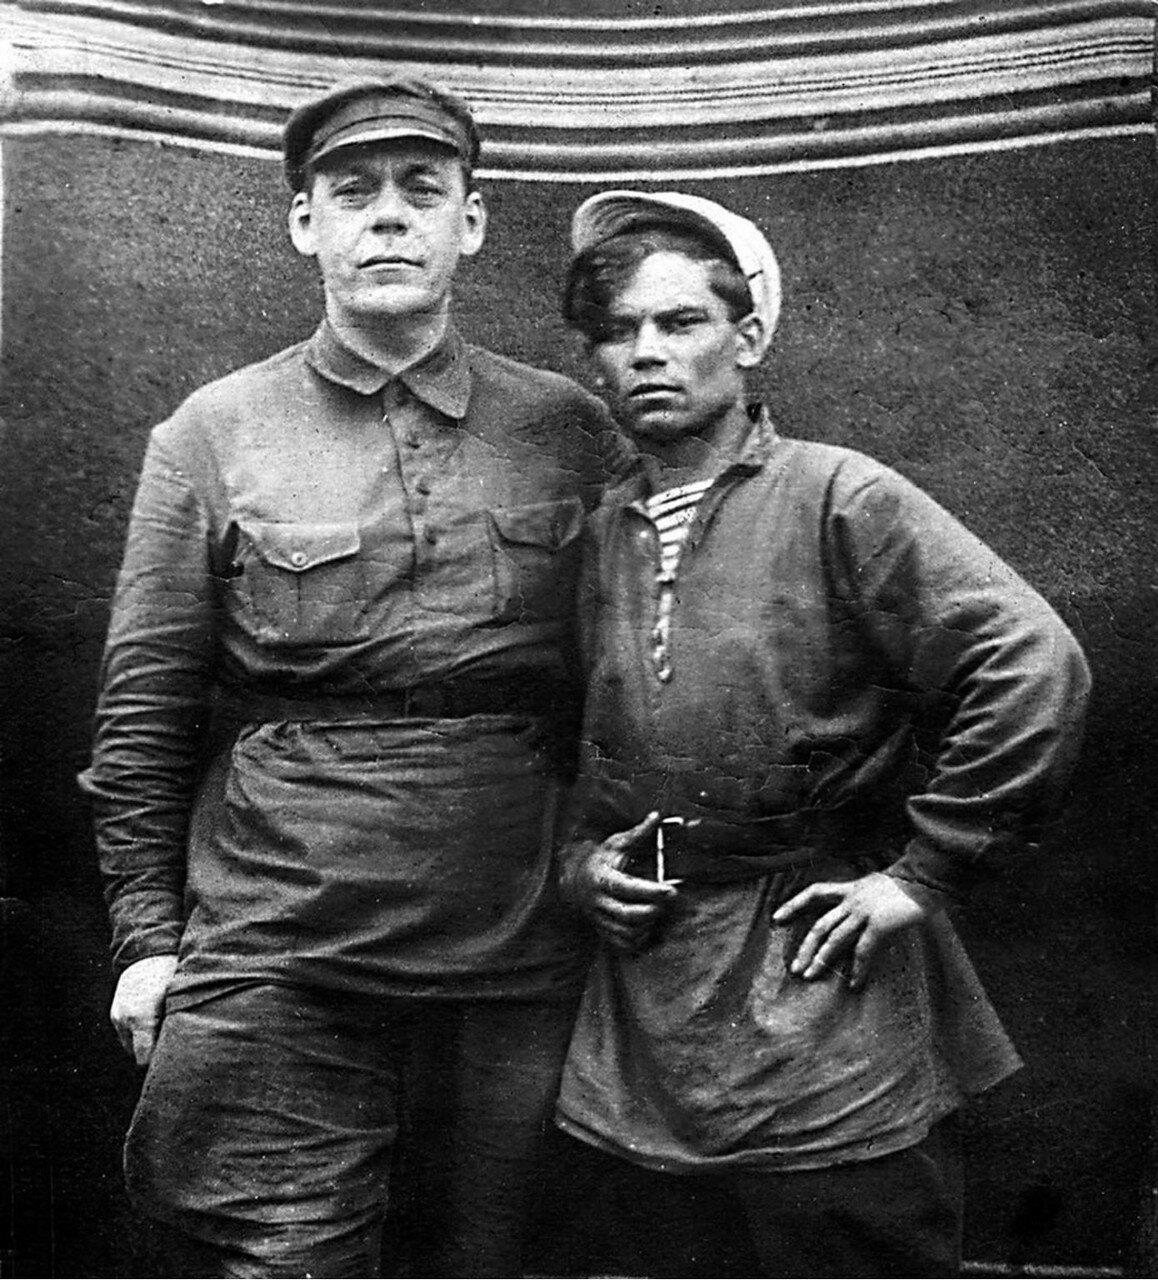 1920-е. Иван Дмитриевич Каширин и комсомолец 1920-х Алексей Степанович Павлов (справа)